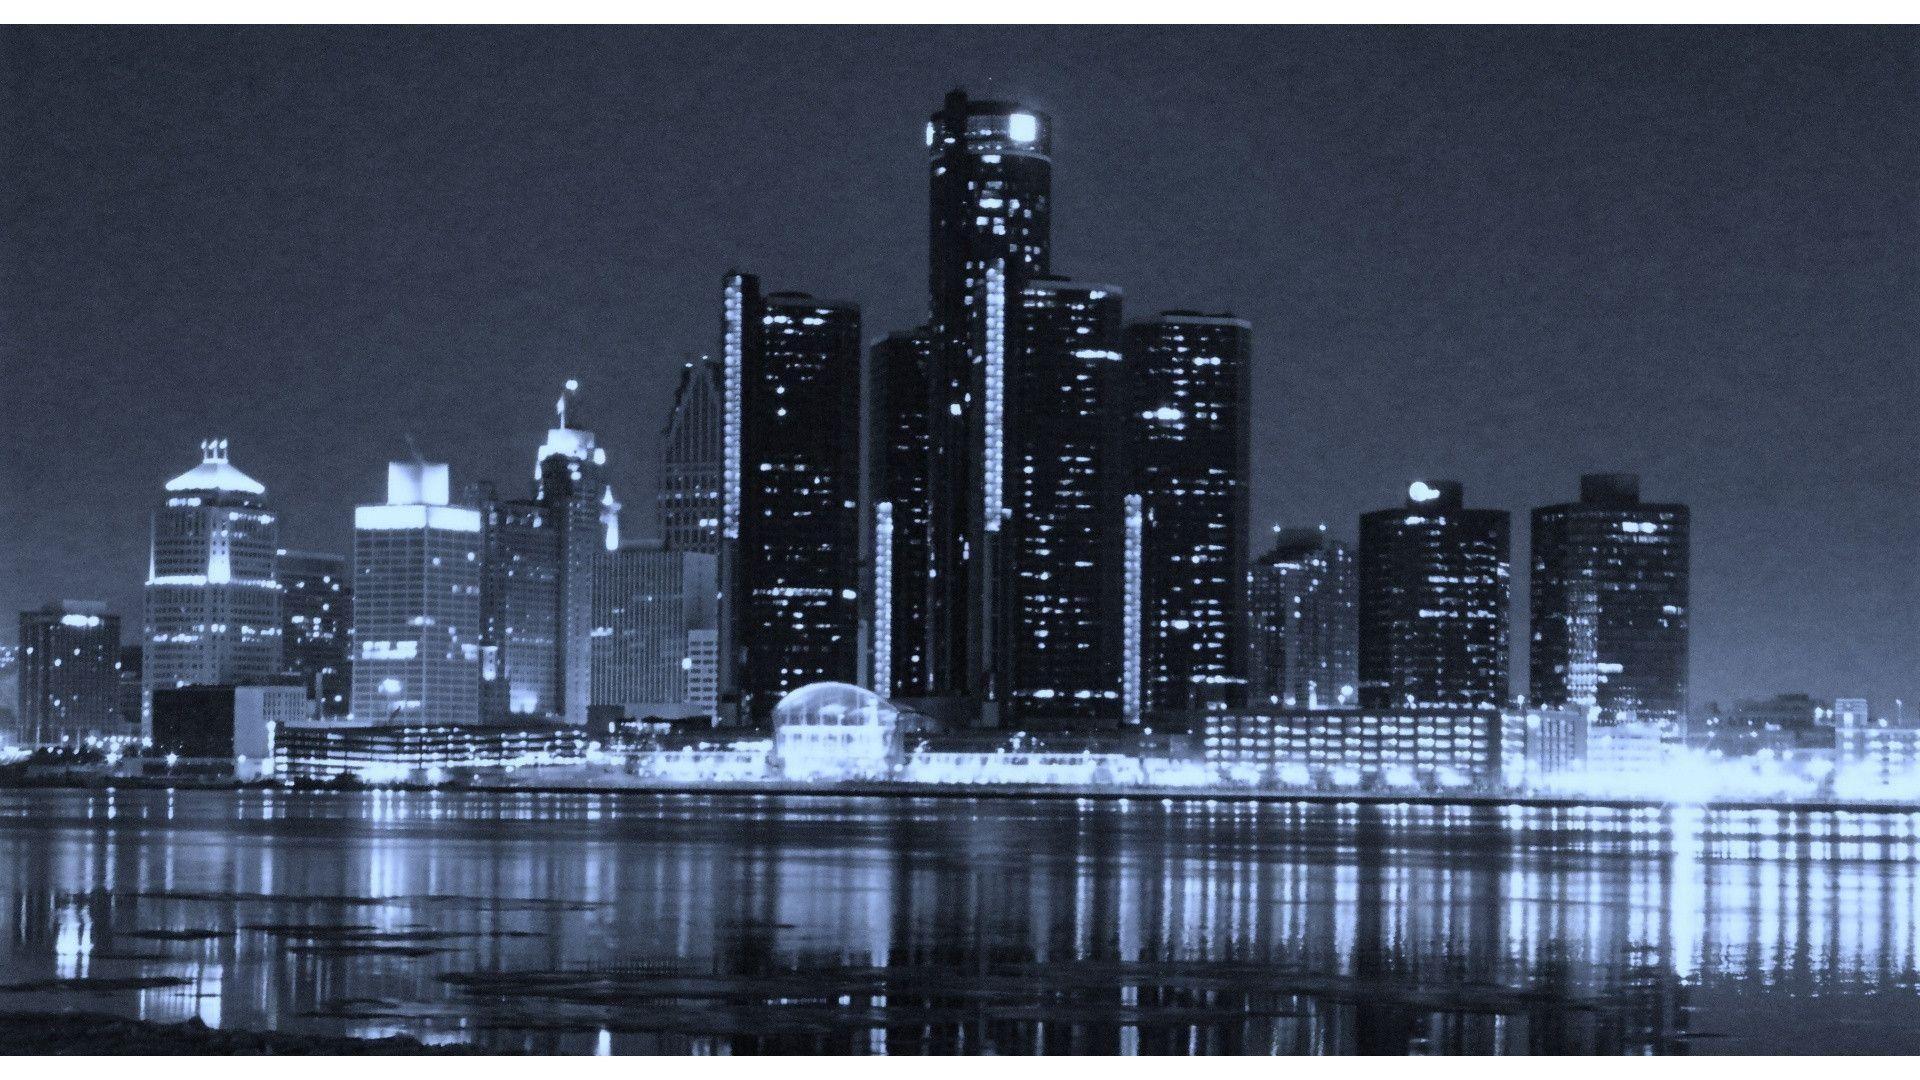 detroit city skyline desktop wallpaper skylines Boston skyline 1920x1080